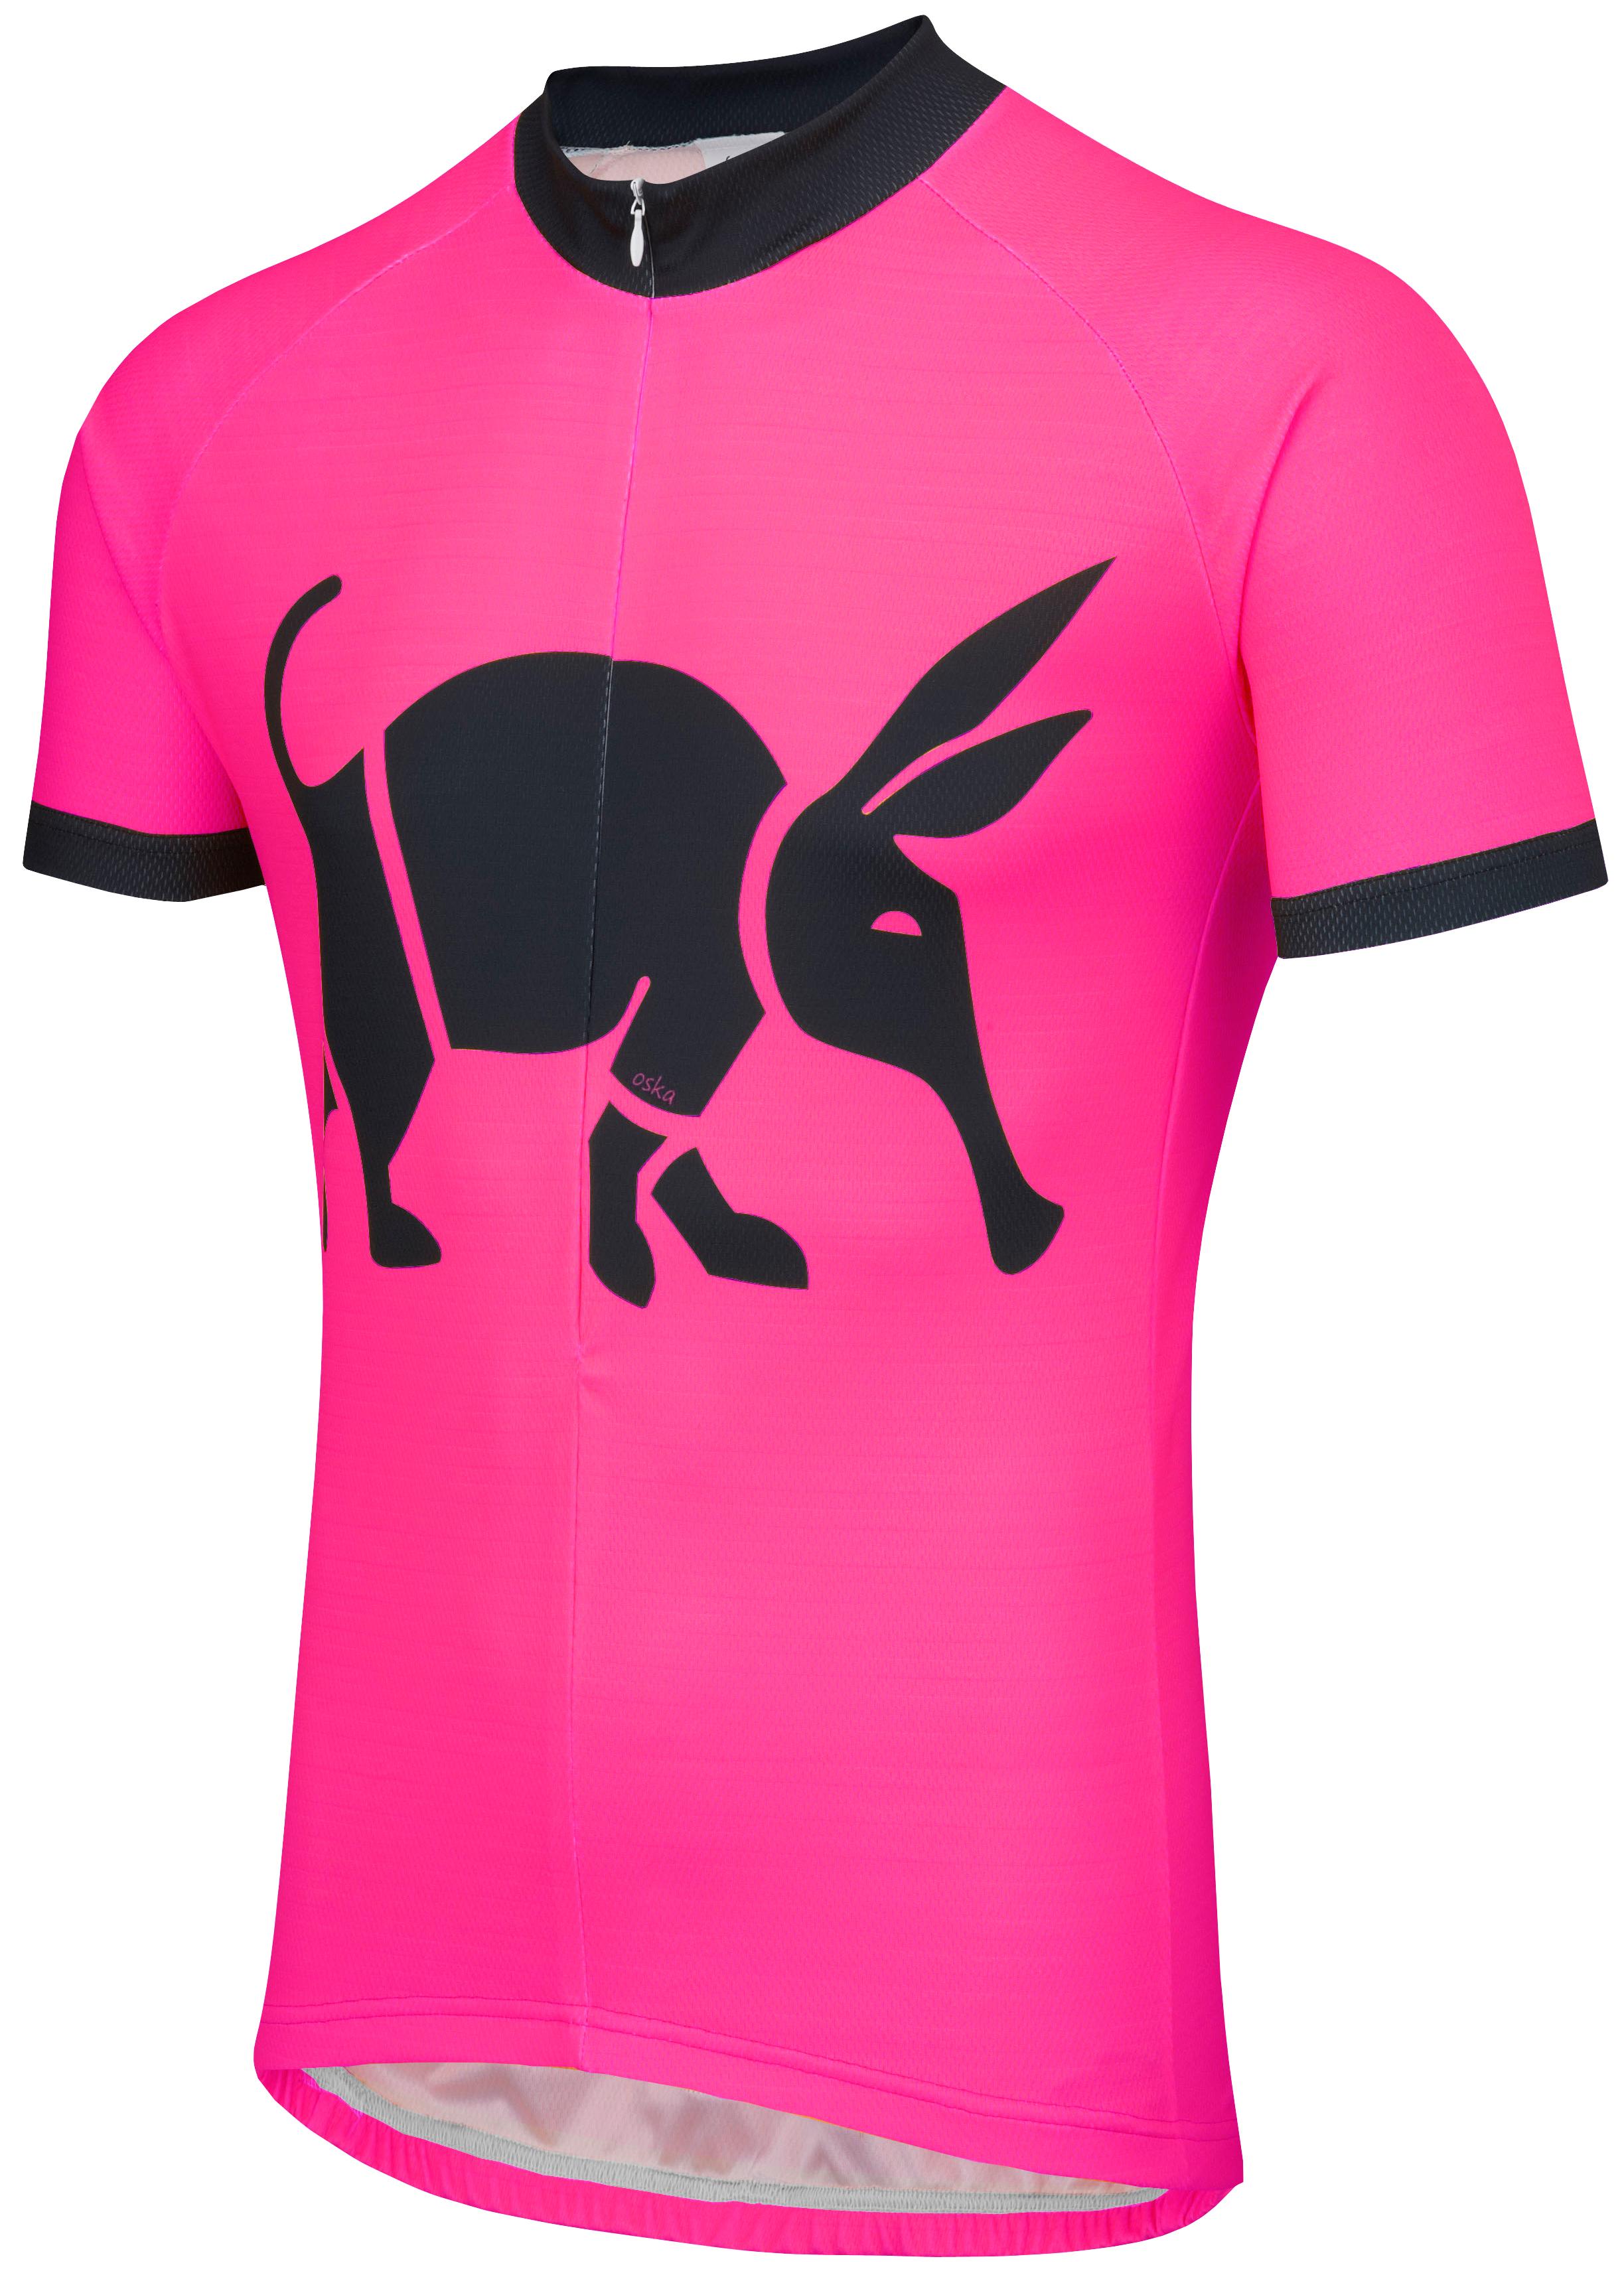 Oska Fluro Pink Road Cycling Jersey Womens Foska Com